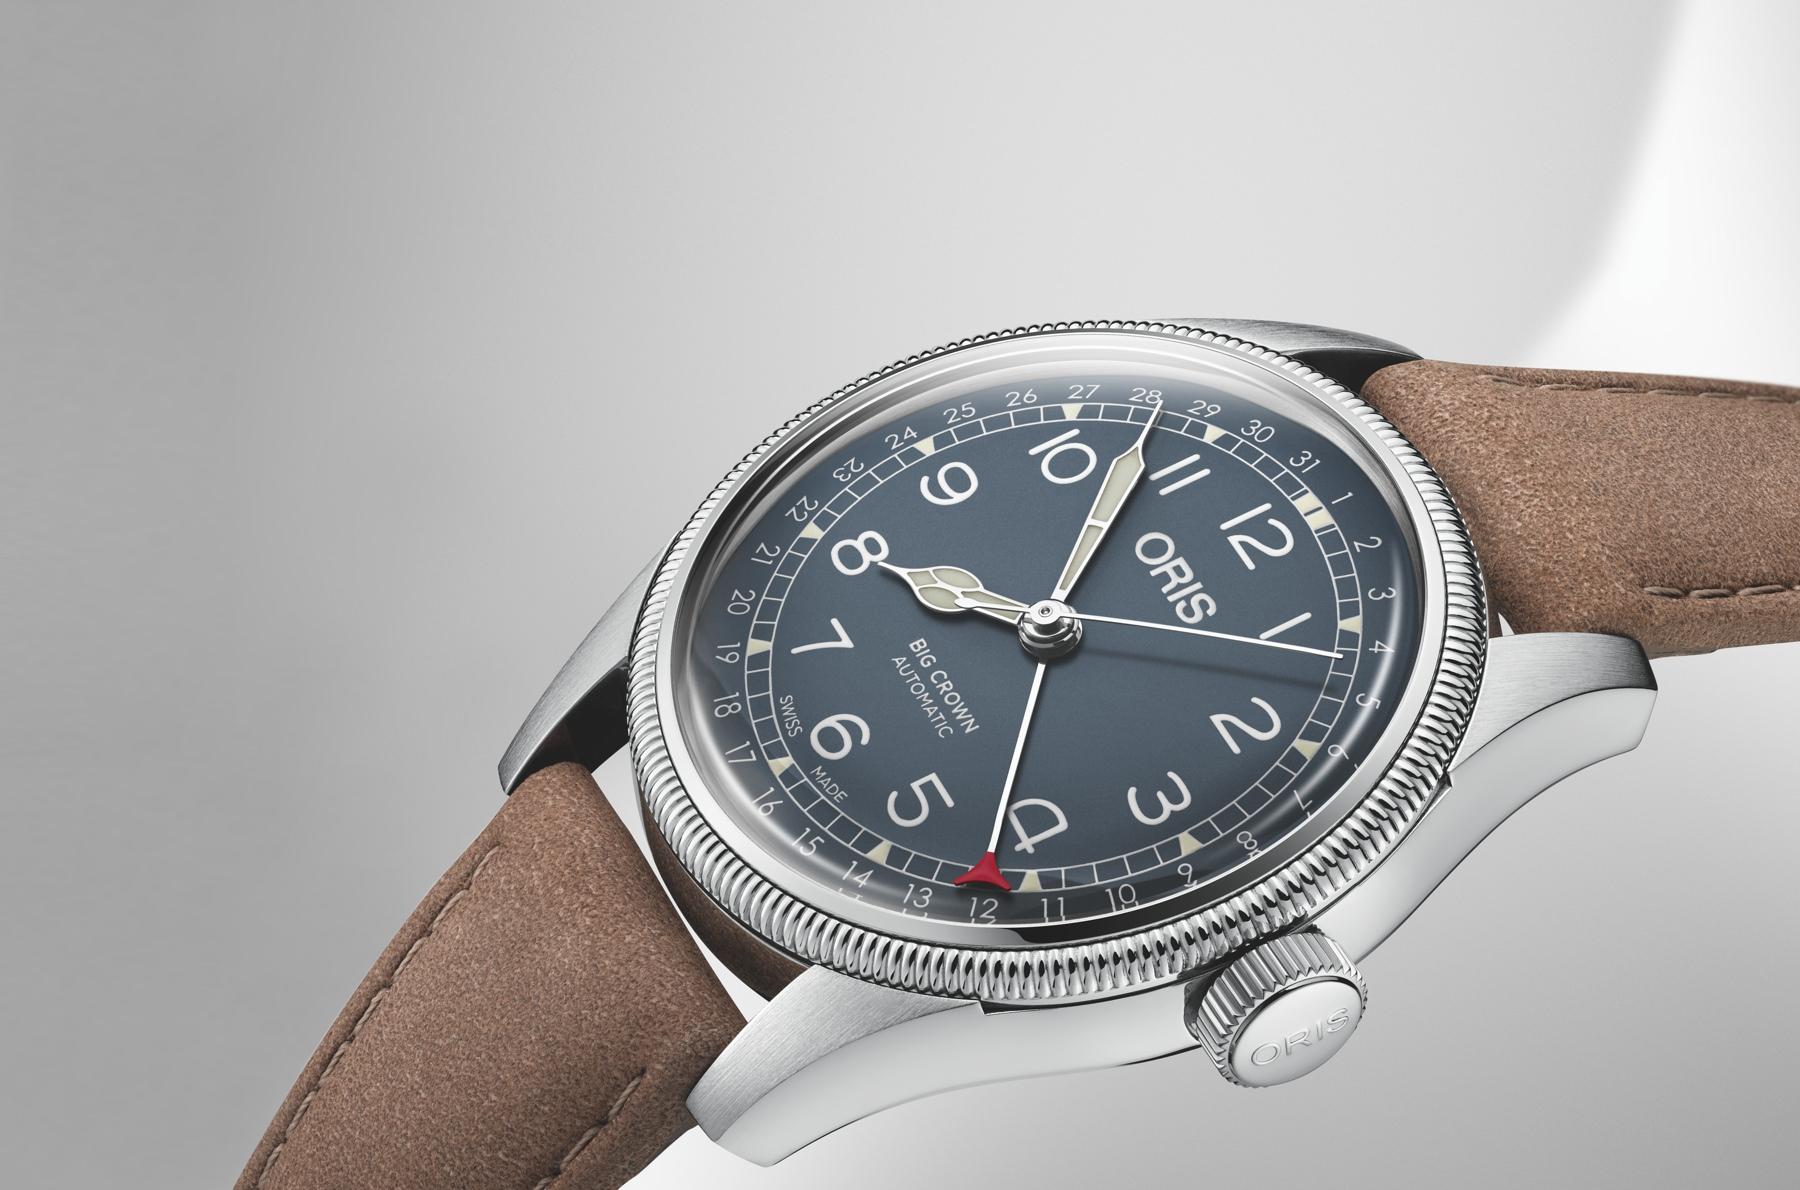 Oris swiss made watches